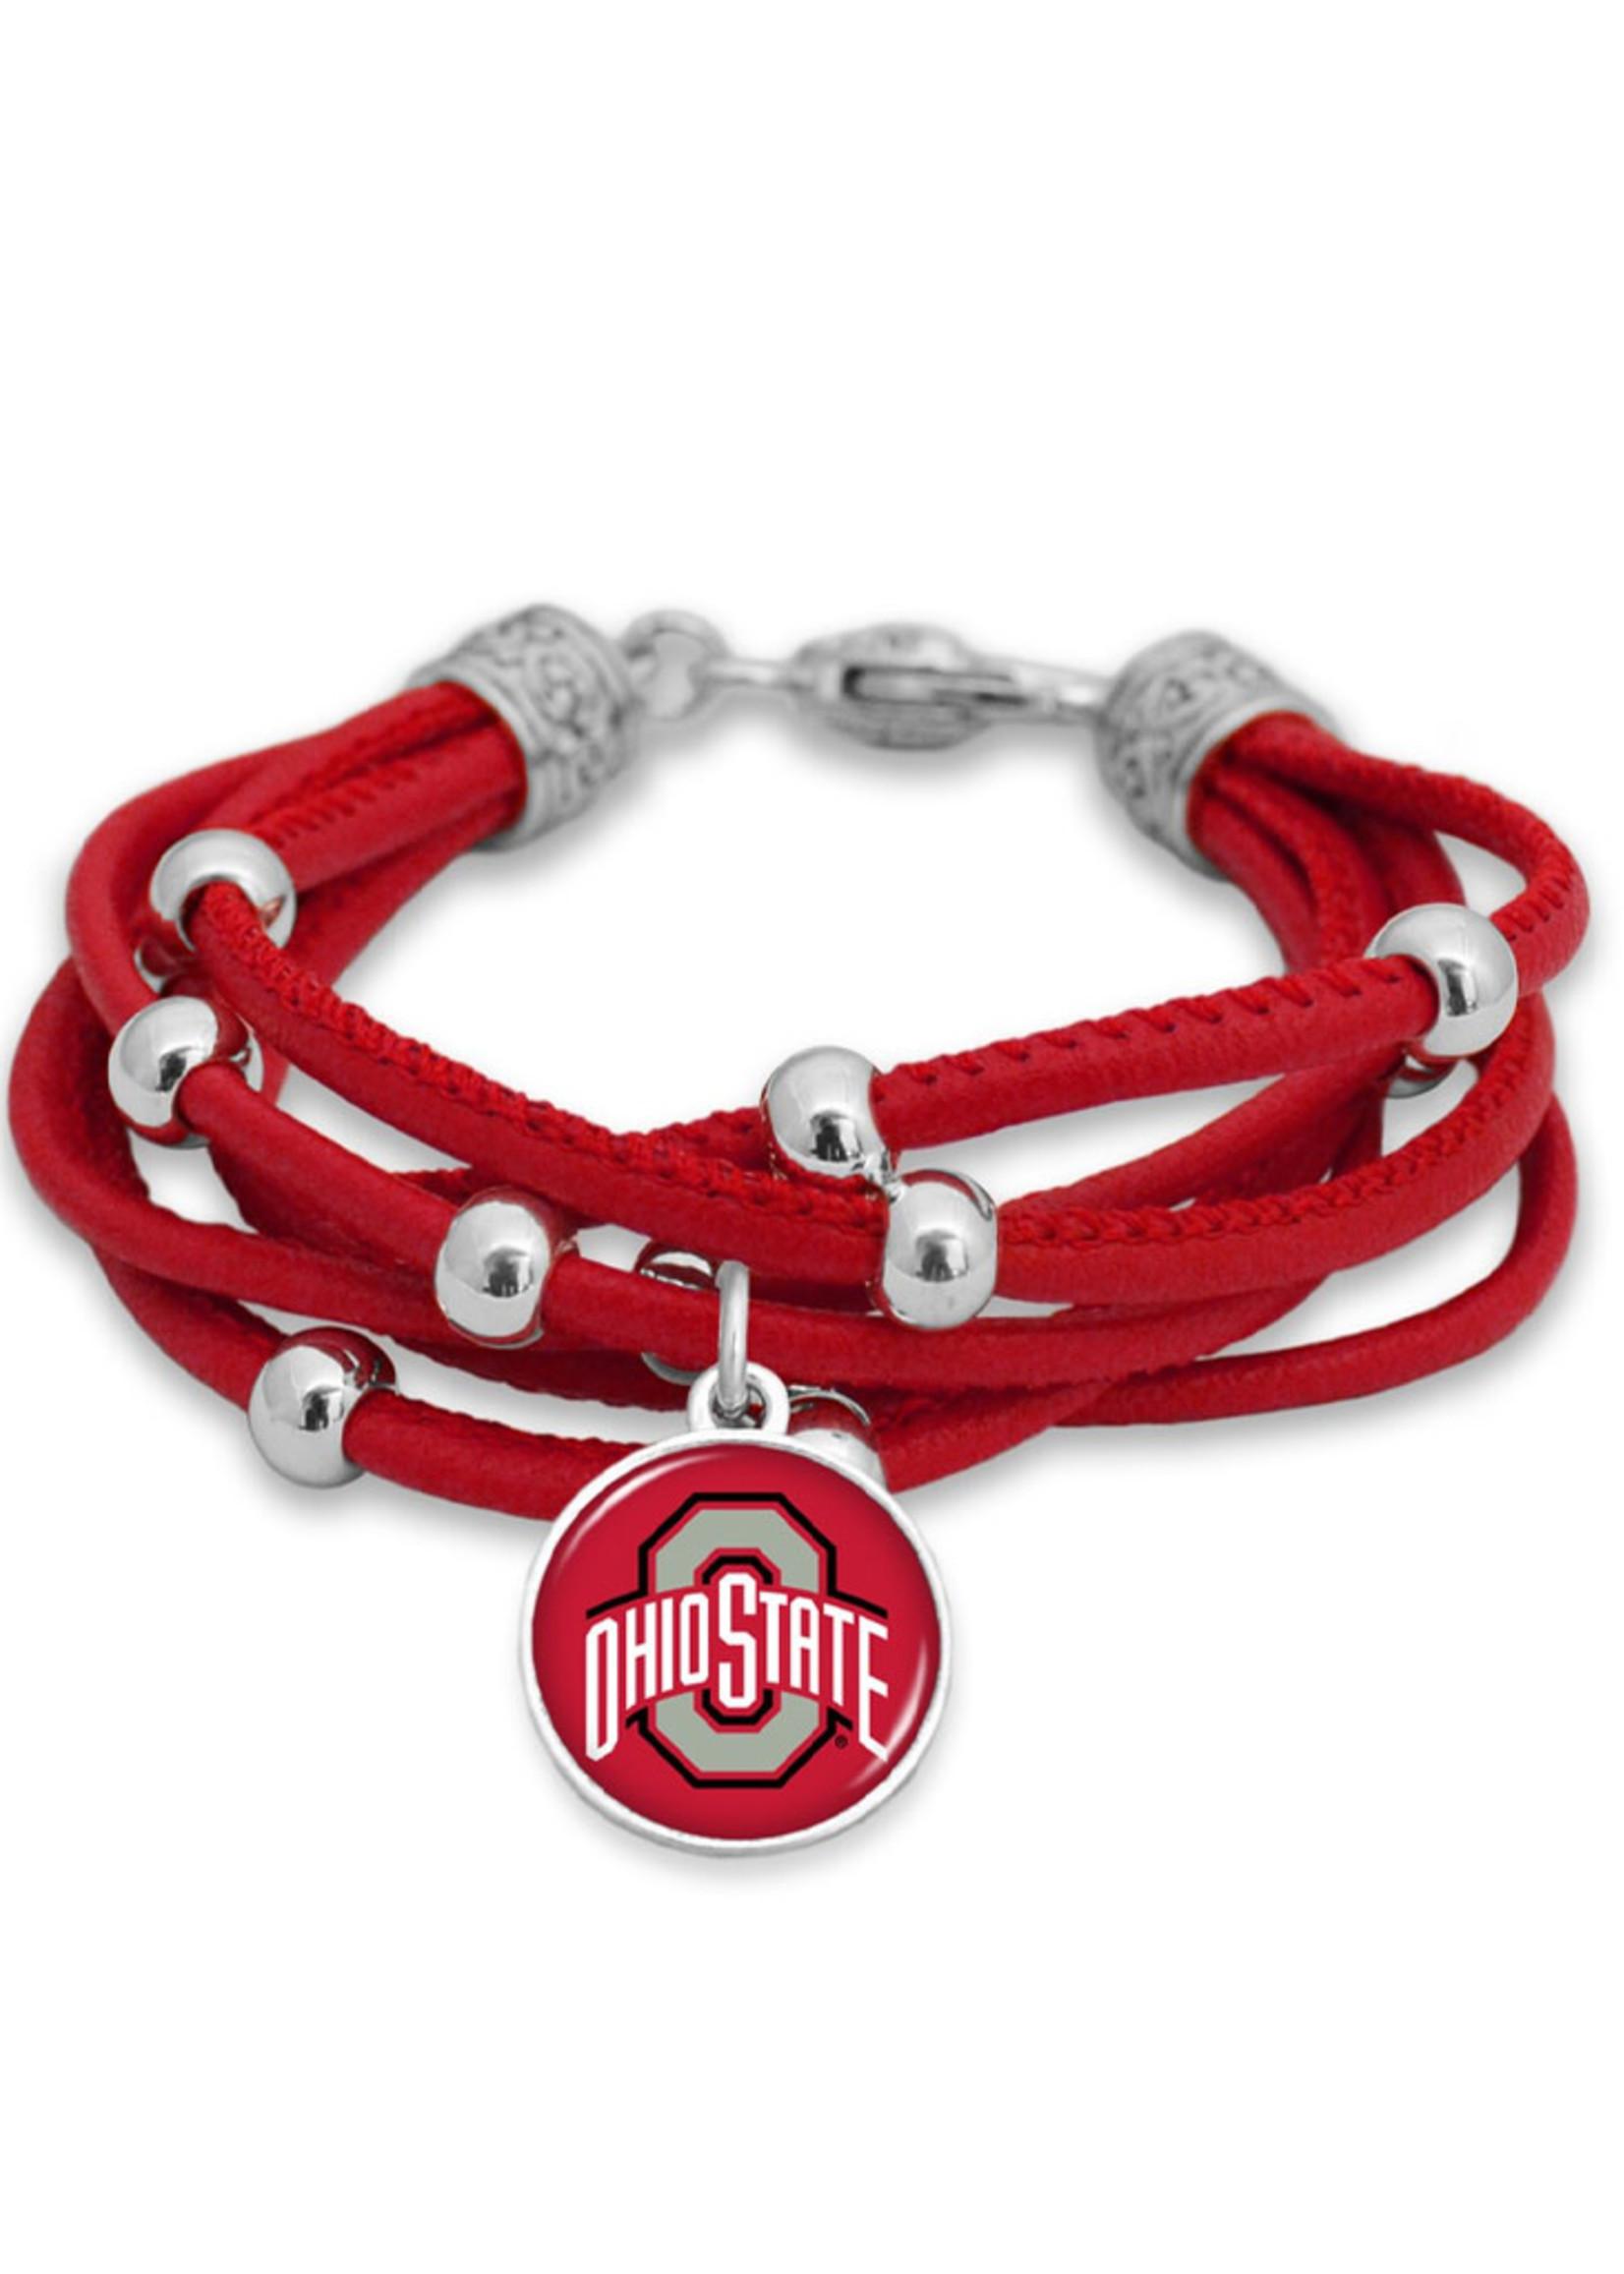 Ohio State Buckeyes Bracelet- Lindy